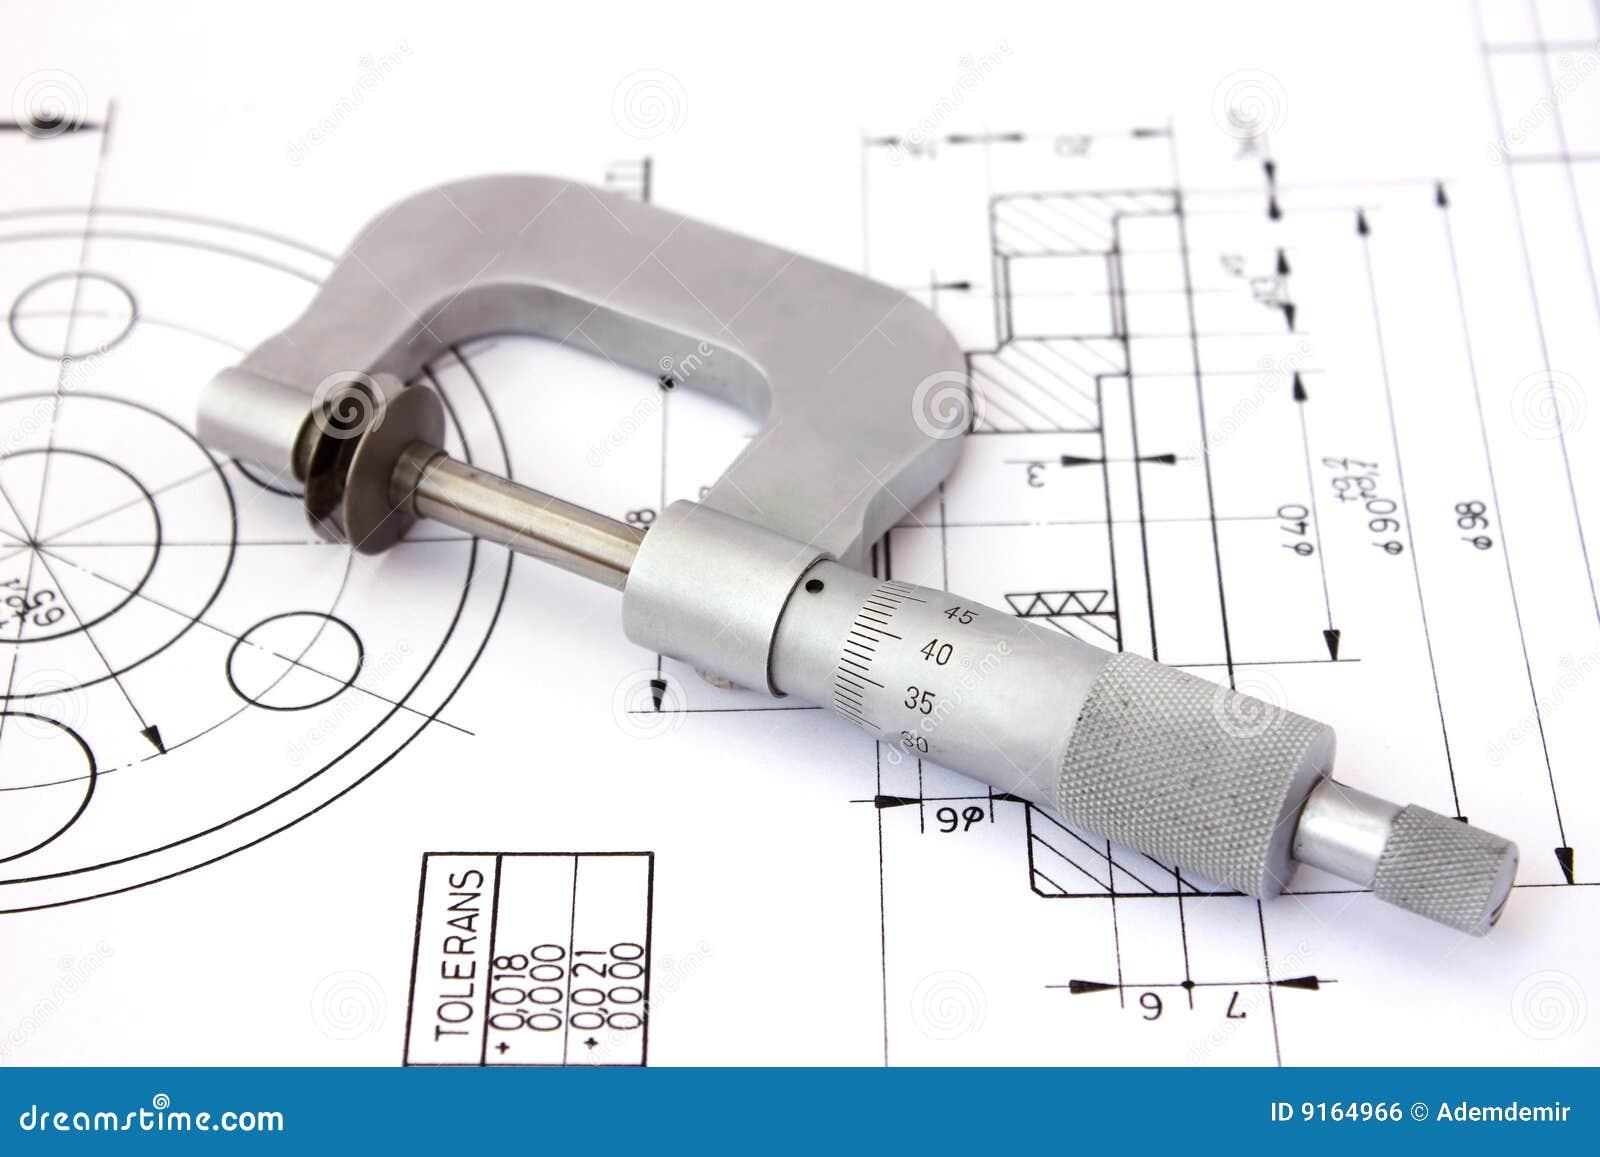 Micrômetro no desenho técnico. Horizontal